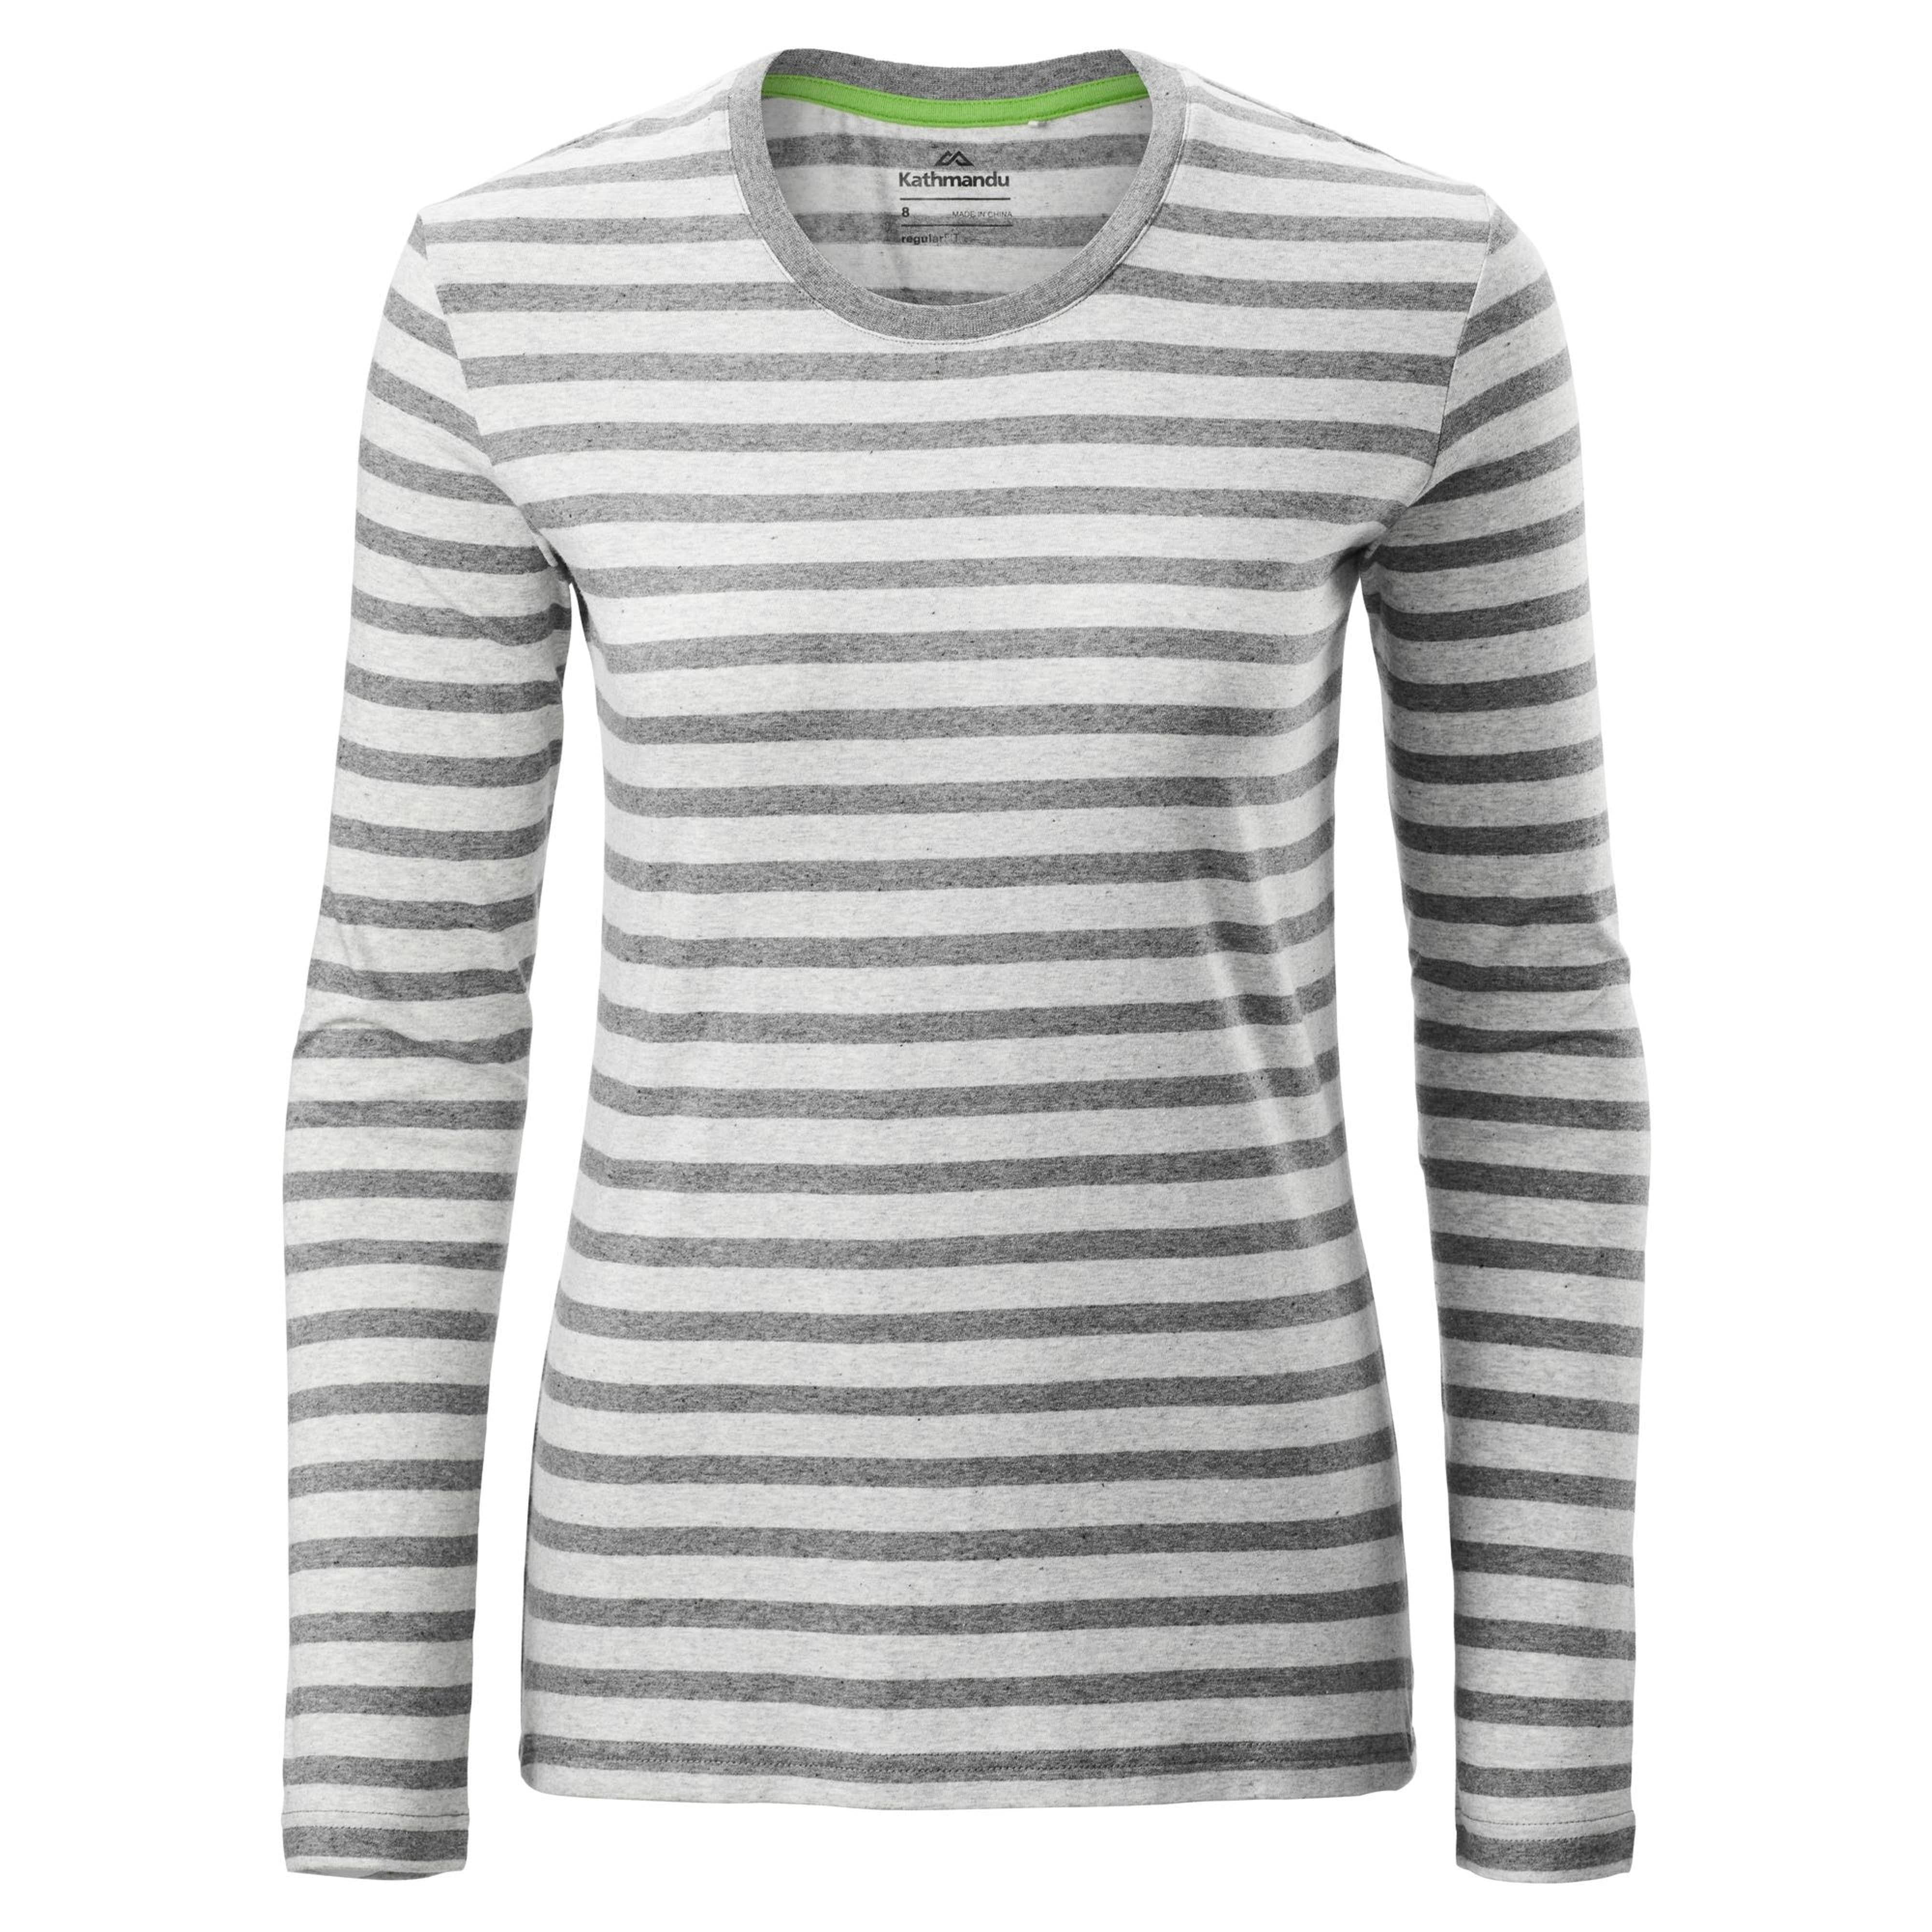 976fb1307b Tops for Women: T-shirts & Shirts Online in Australia | Kathmandu